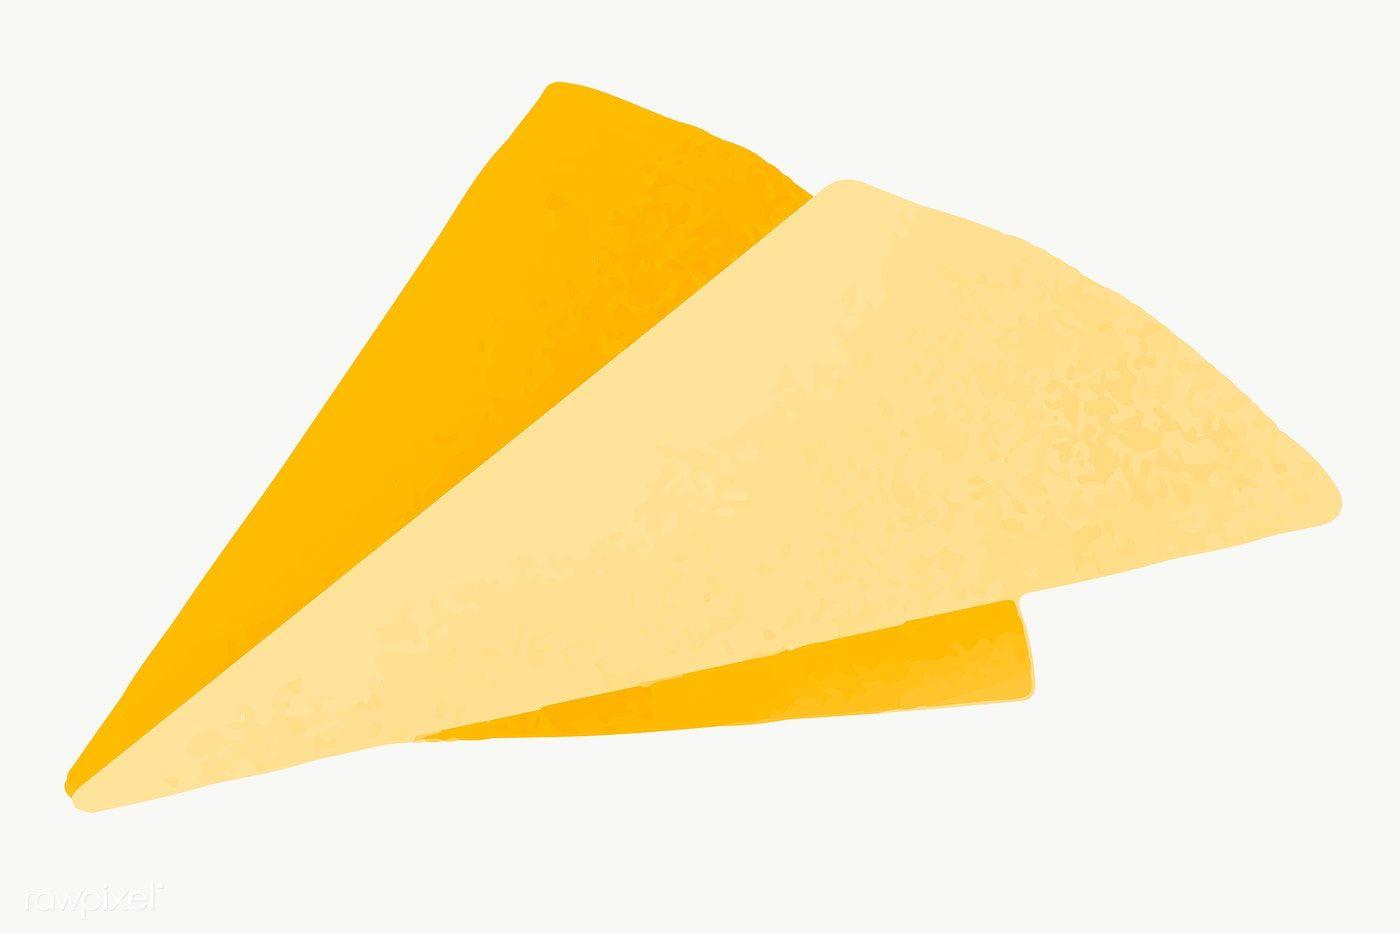 Yellow Origami Paper Plane Icon Transparent Png Premium Image By Rawpixel Com Aum Paper Plane Plane Icon Origami Paper Plane